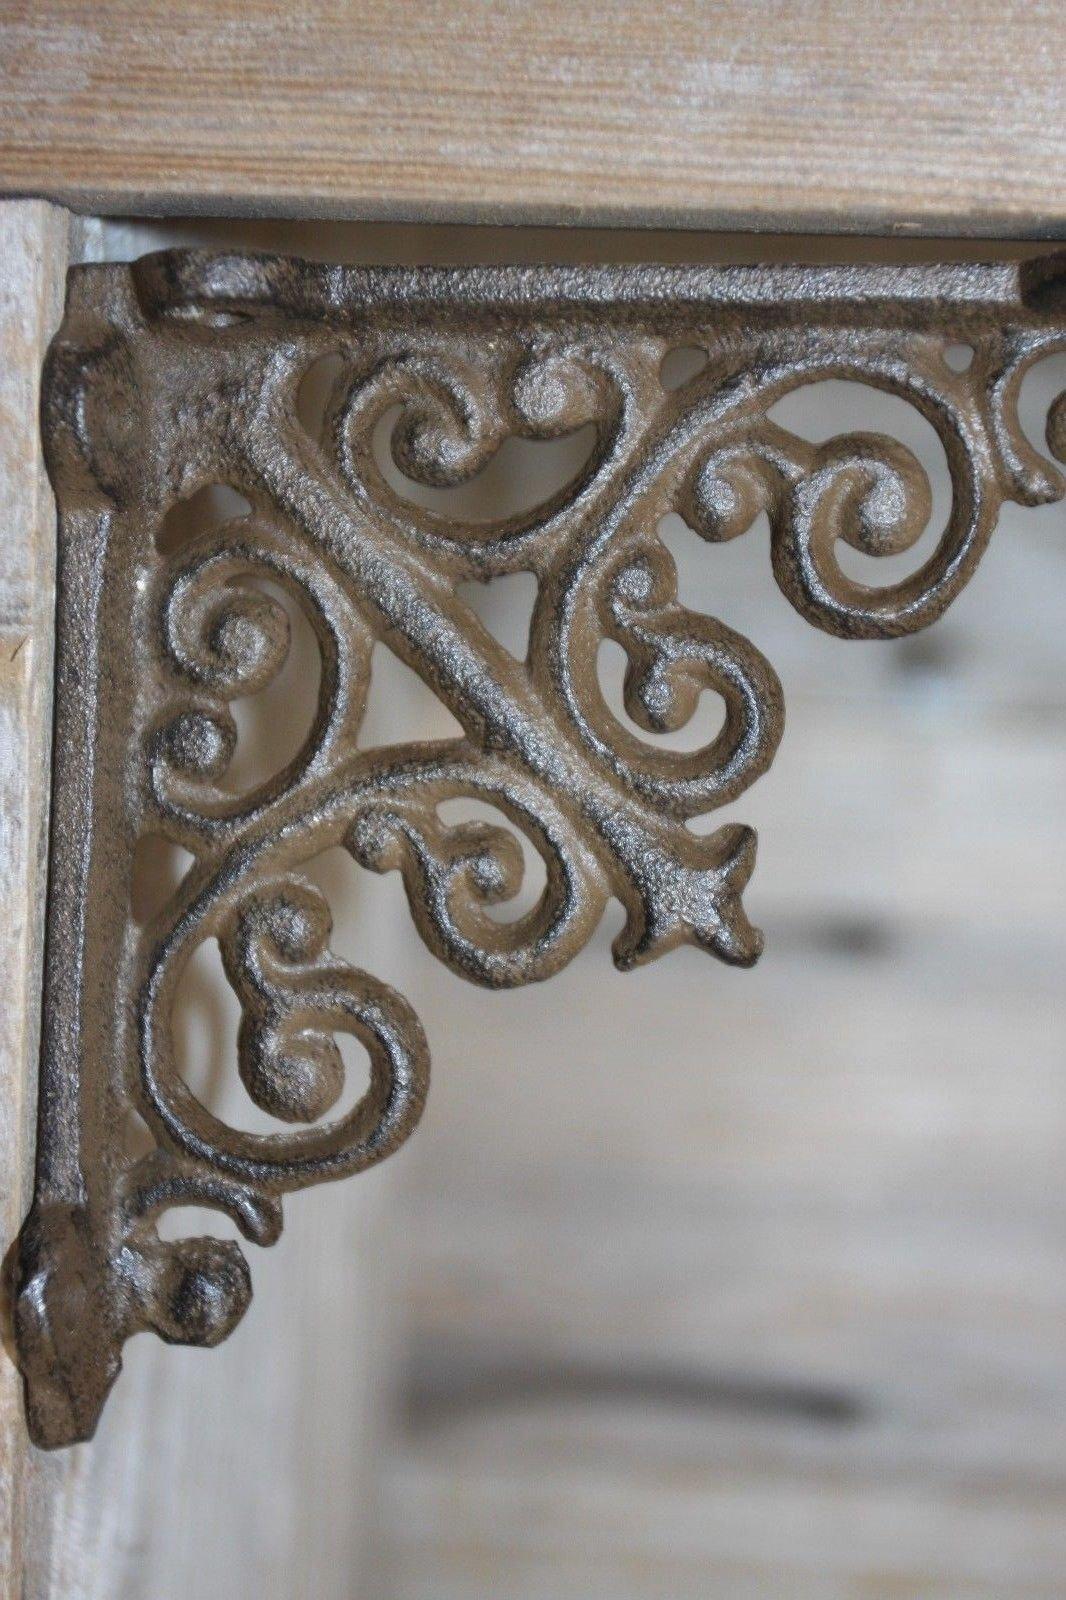 Southern Metal Set of 10 Small Cast Iron Shelf Brackets 3 3/4'' x 3 7/8'' Volume Priced B-27